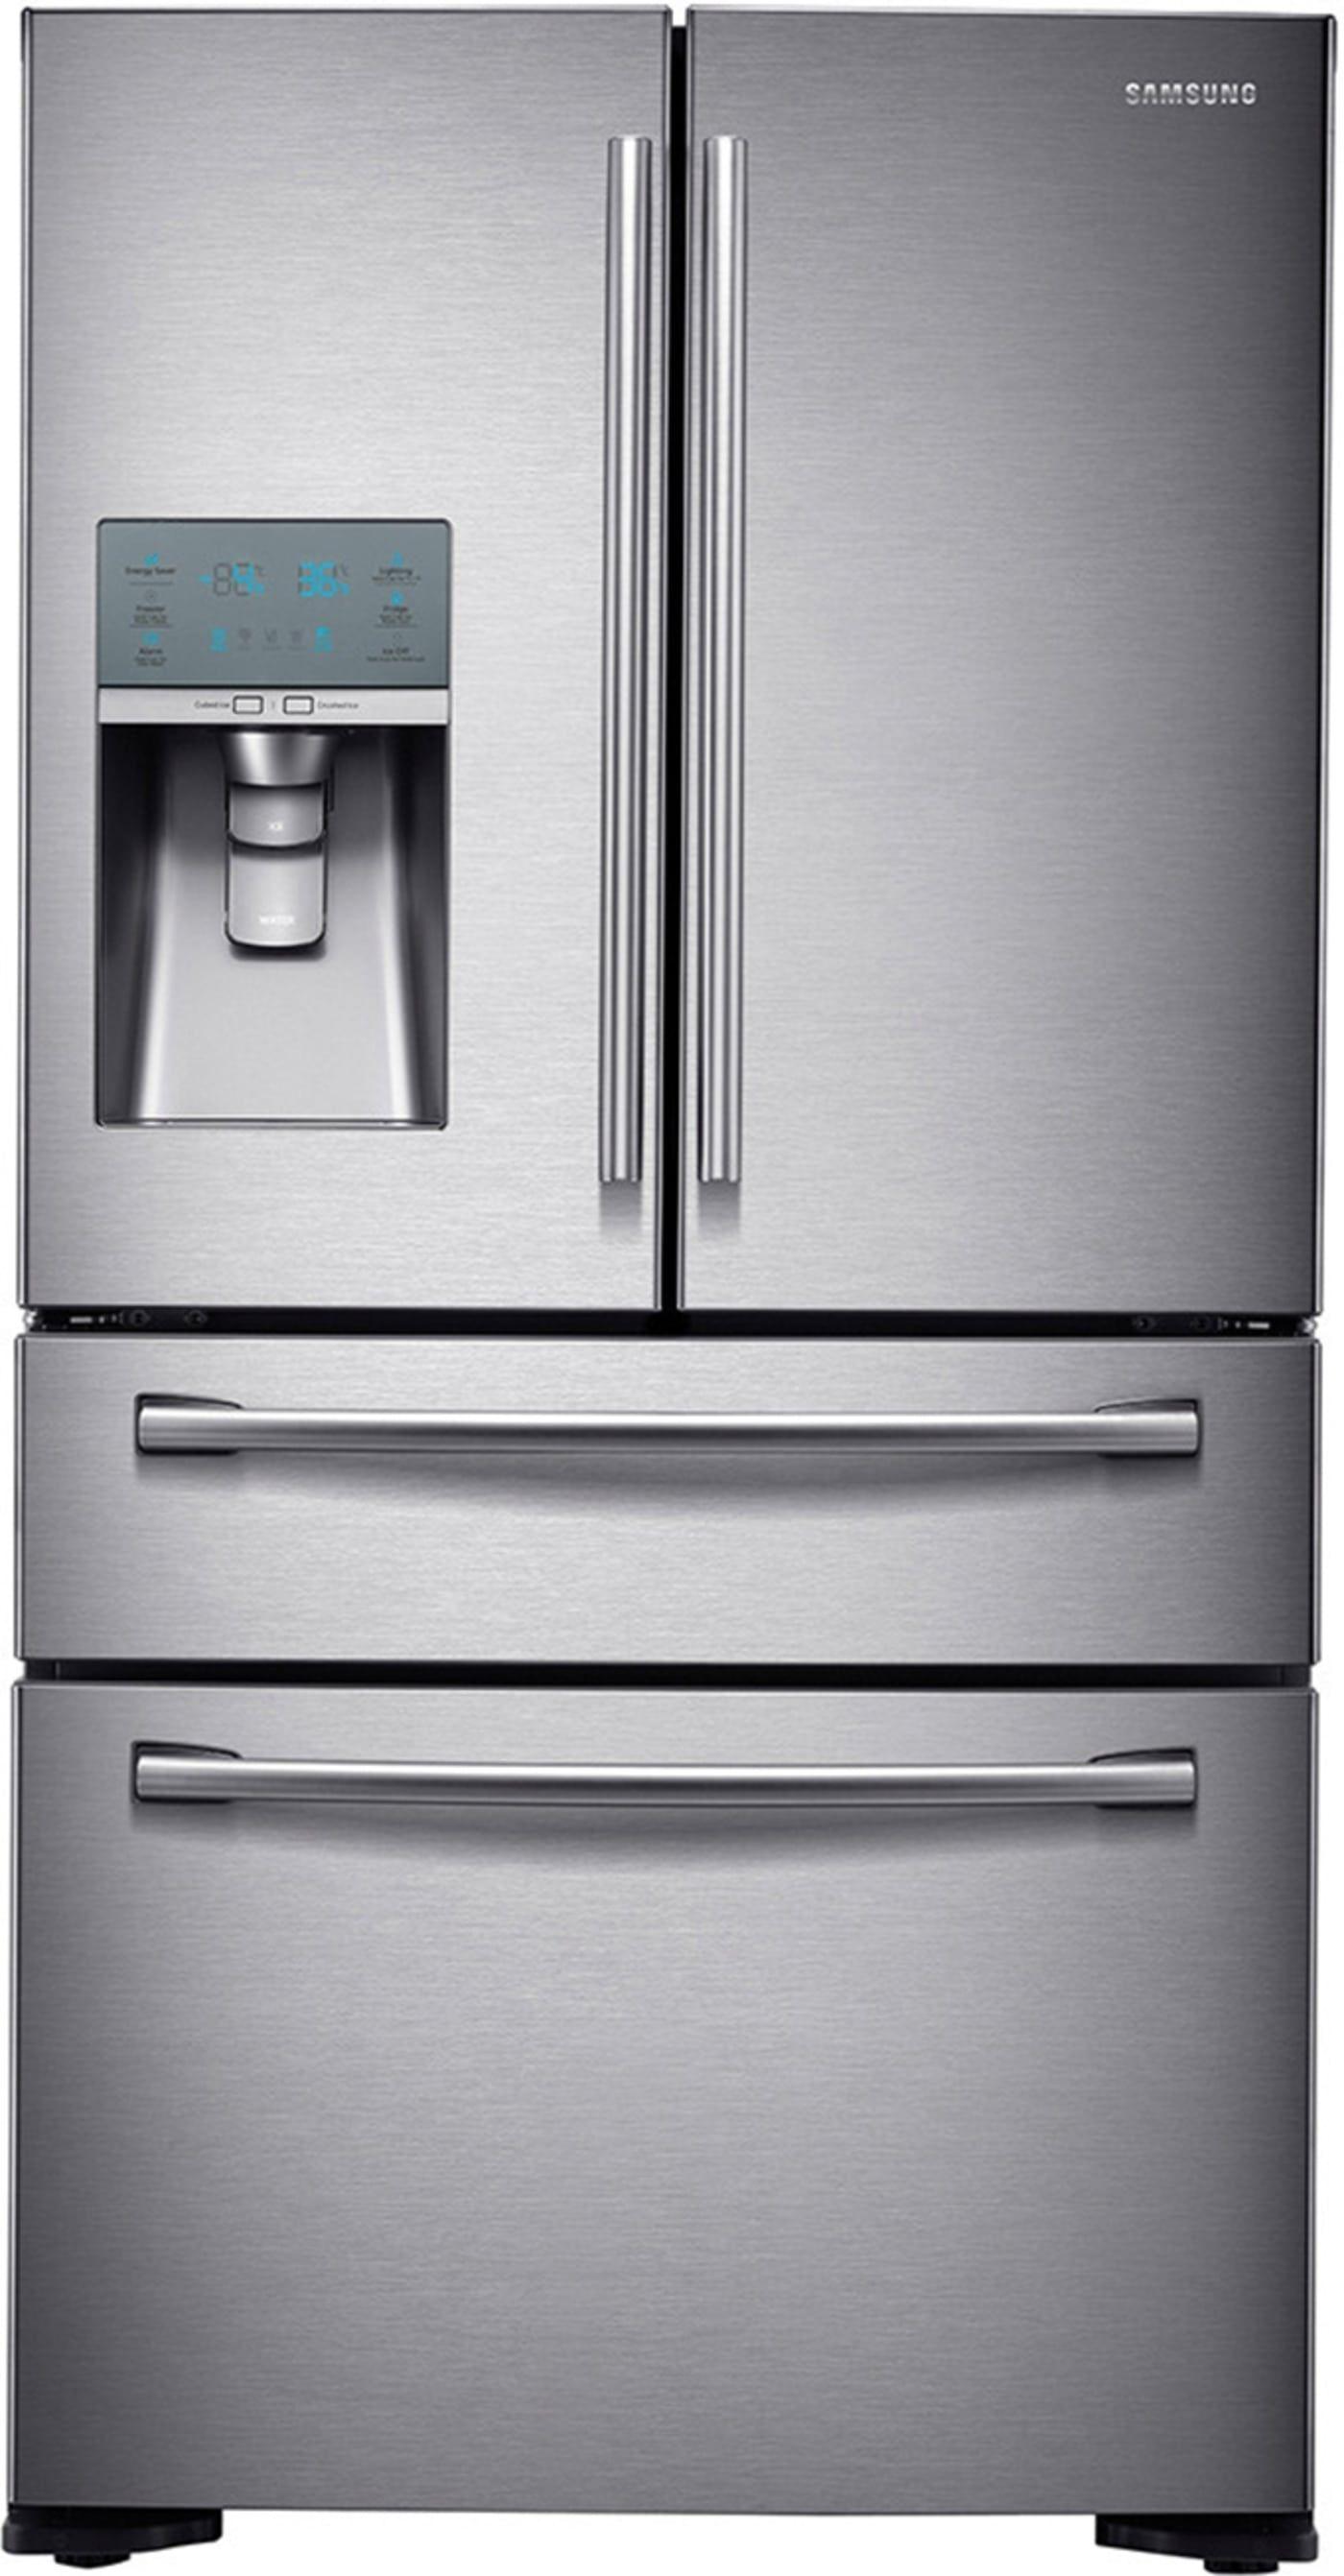 Rf24fsedbsr By Samsung French Door Refrigerators Goedekers Com French Door Refrigerator Stainless Steel French Door Refrigerator Samsung Fridge